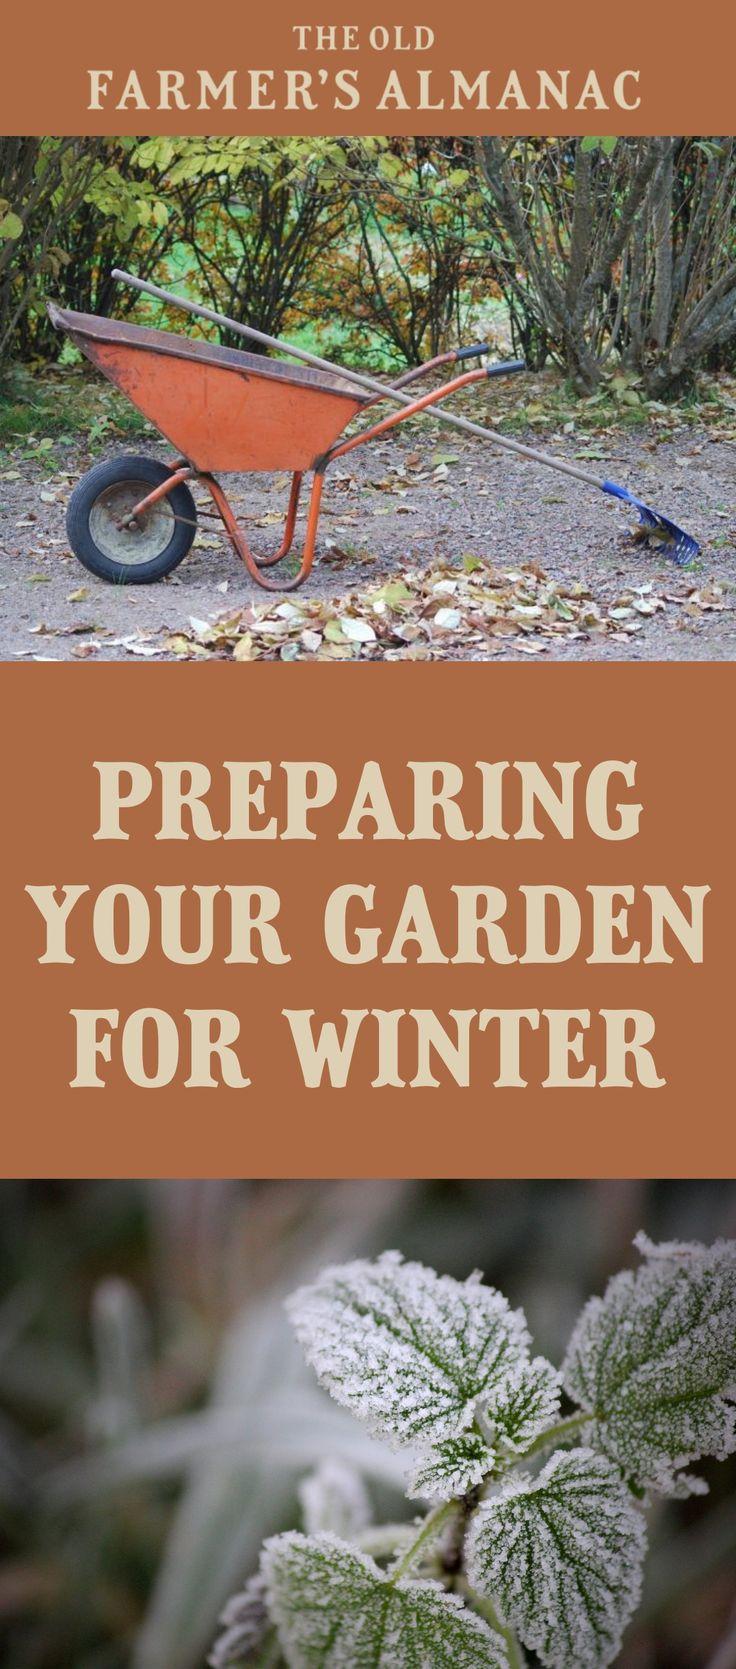 202 best gardening tips images on pinterest old farmers almanac